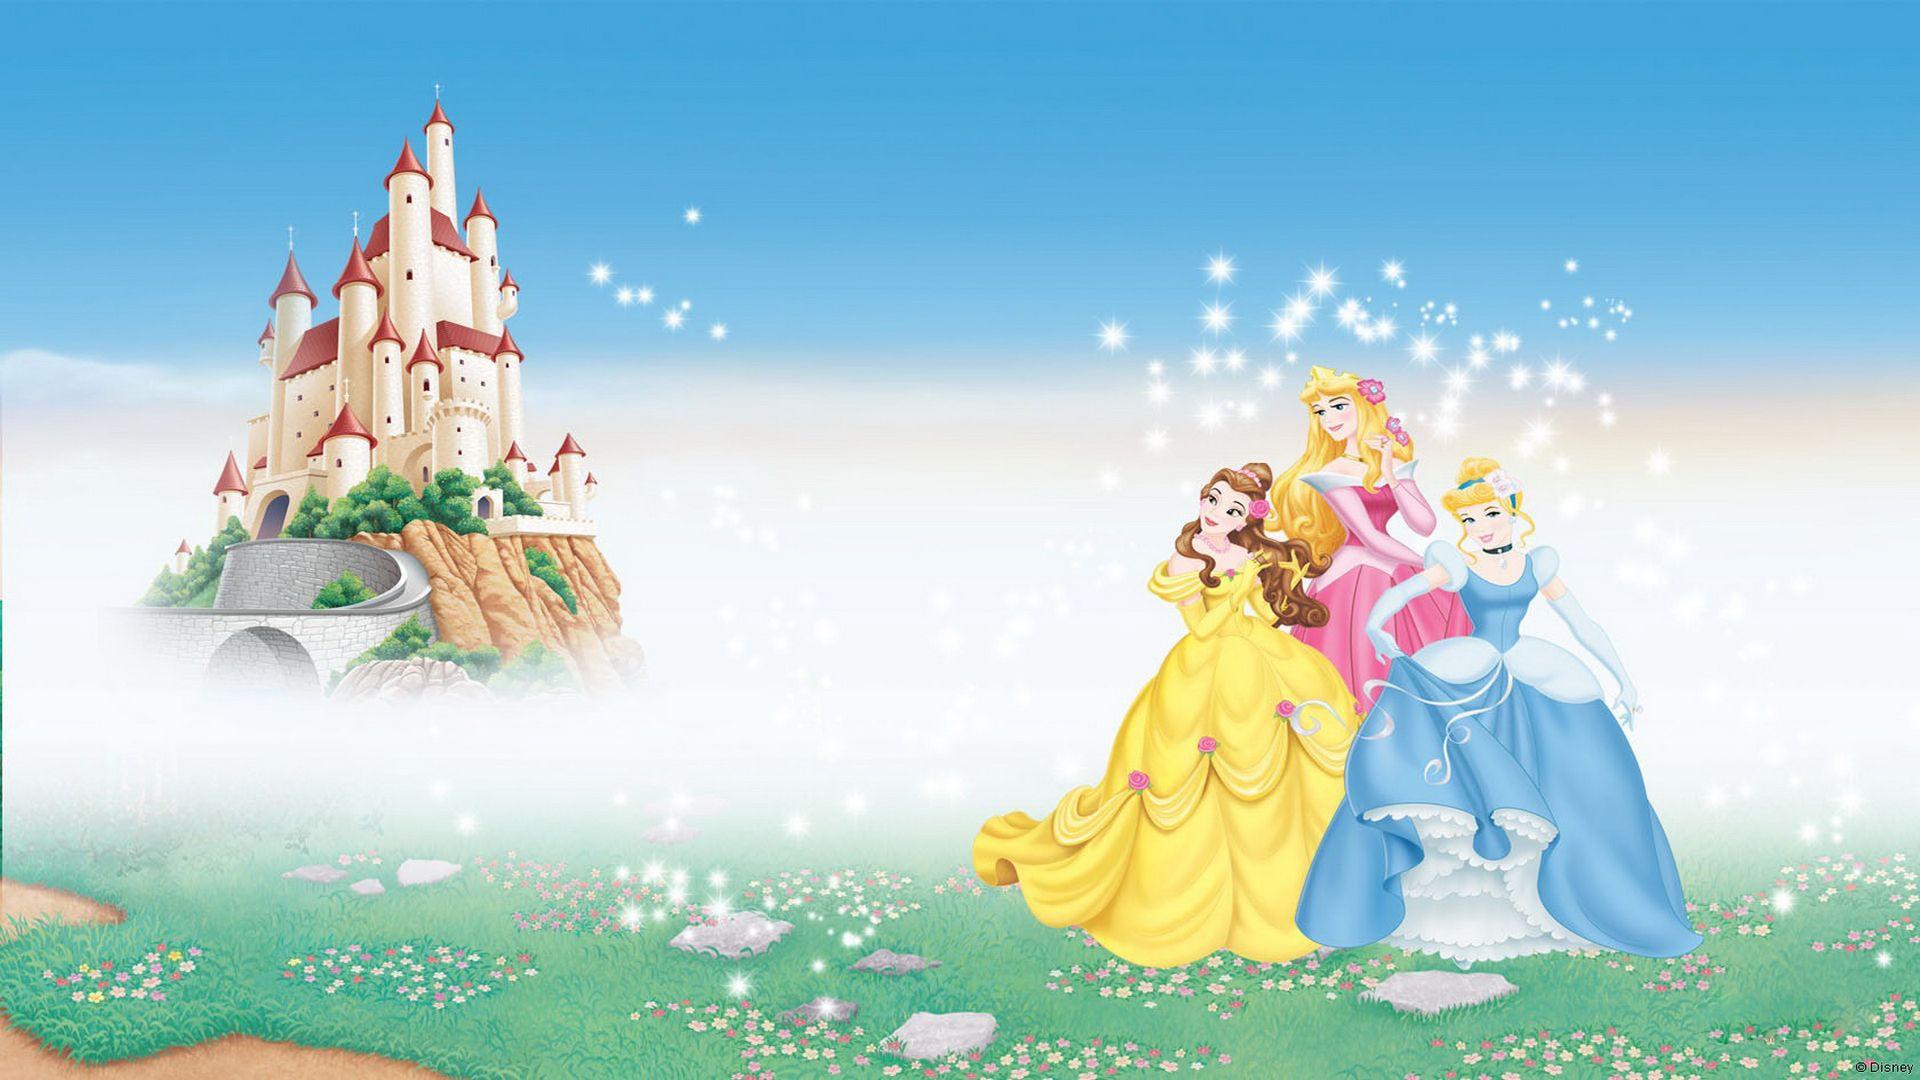 Princess Wallpaper HD Принцесса дисней фото, Принцессы